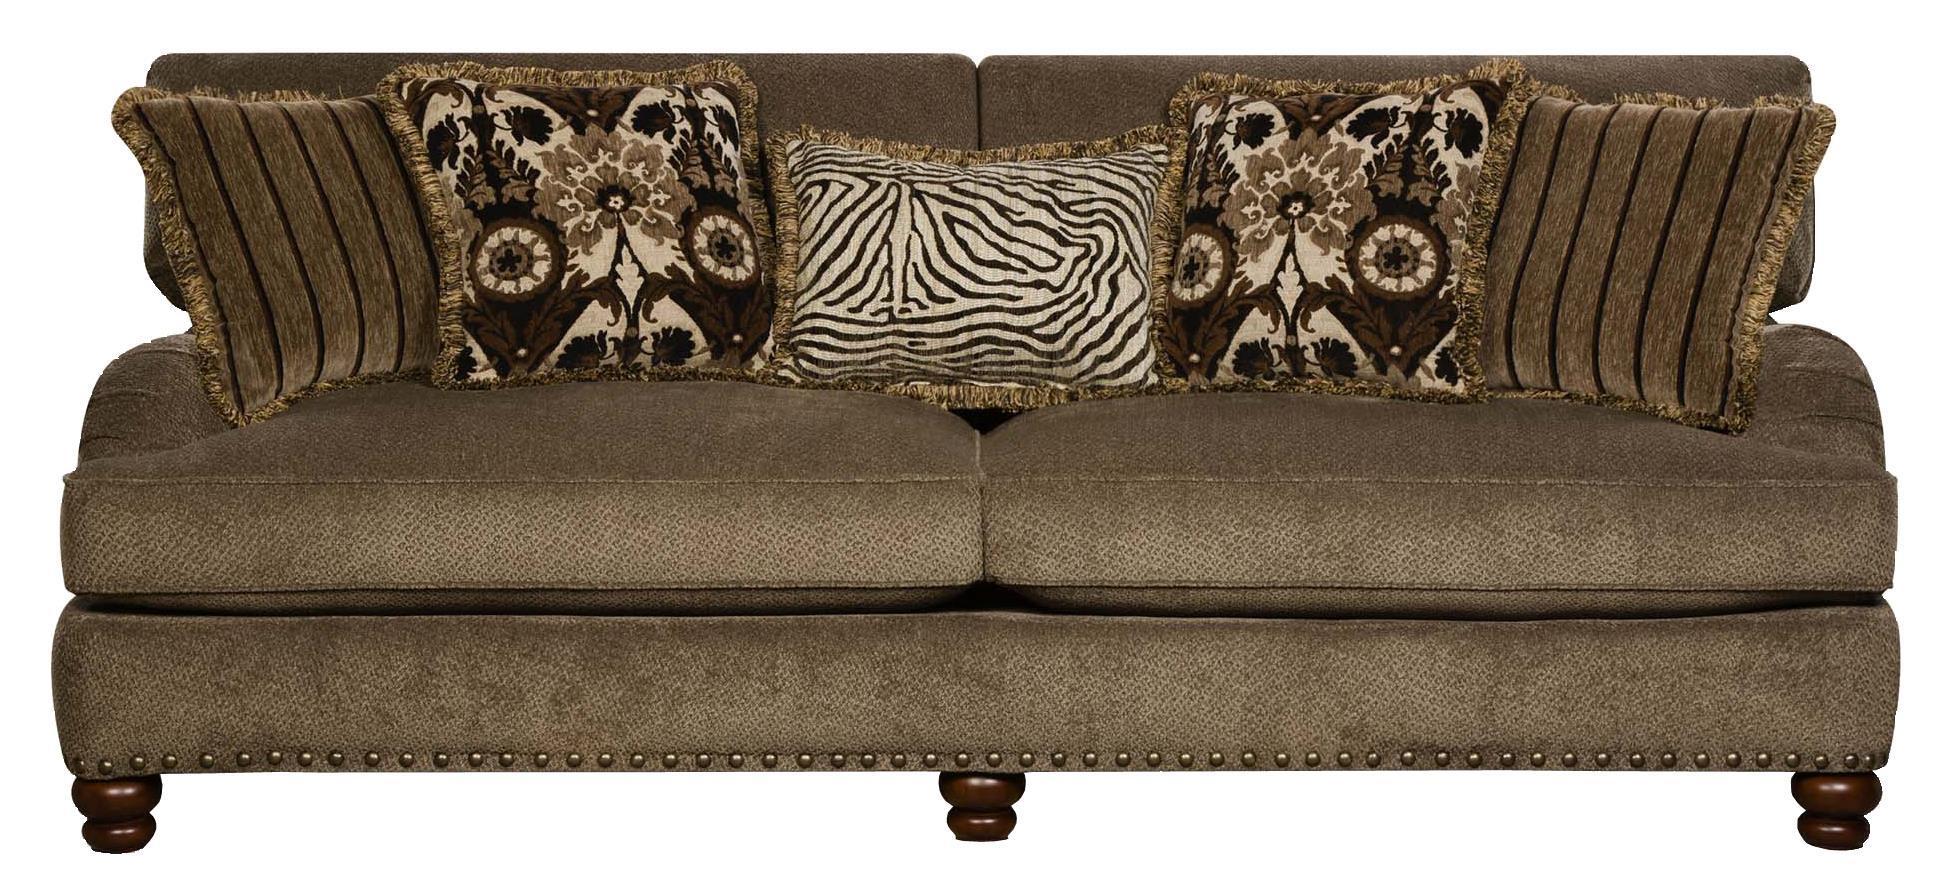 corinthian leather sofa laura ashley spare covers 20 ideas of sofas